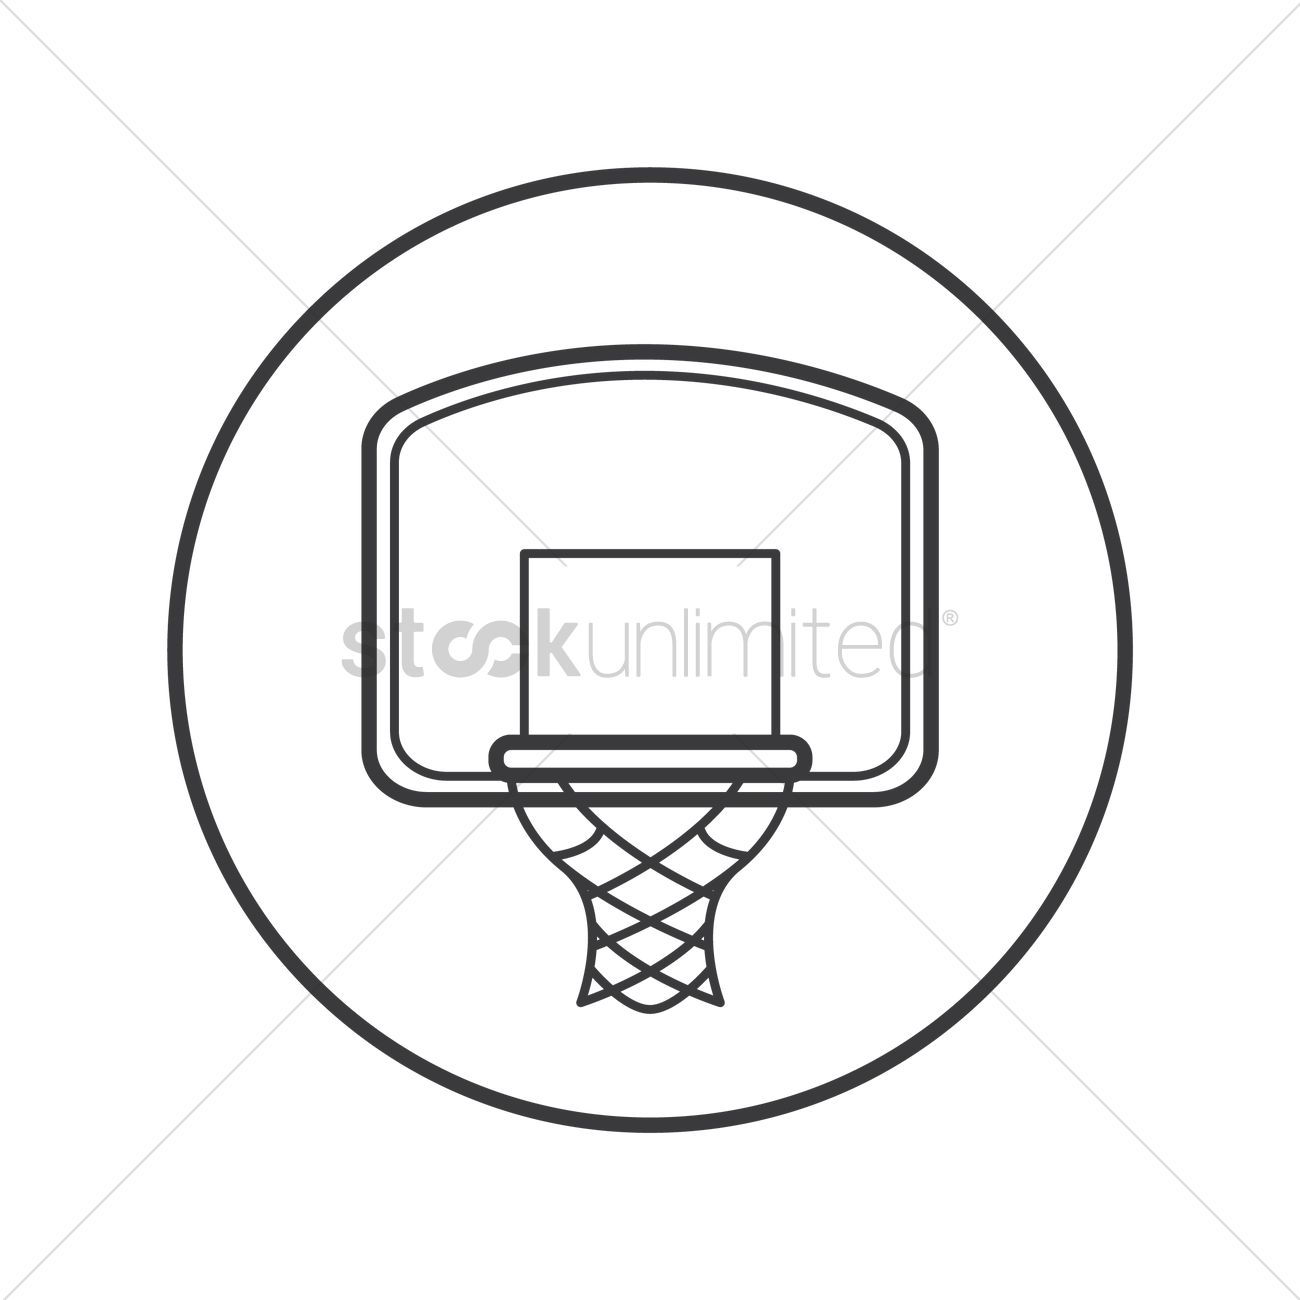 Free Basketball Hoop Vector Image